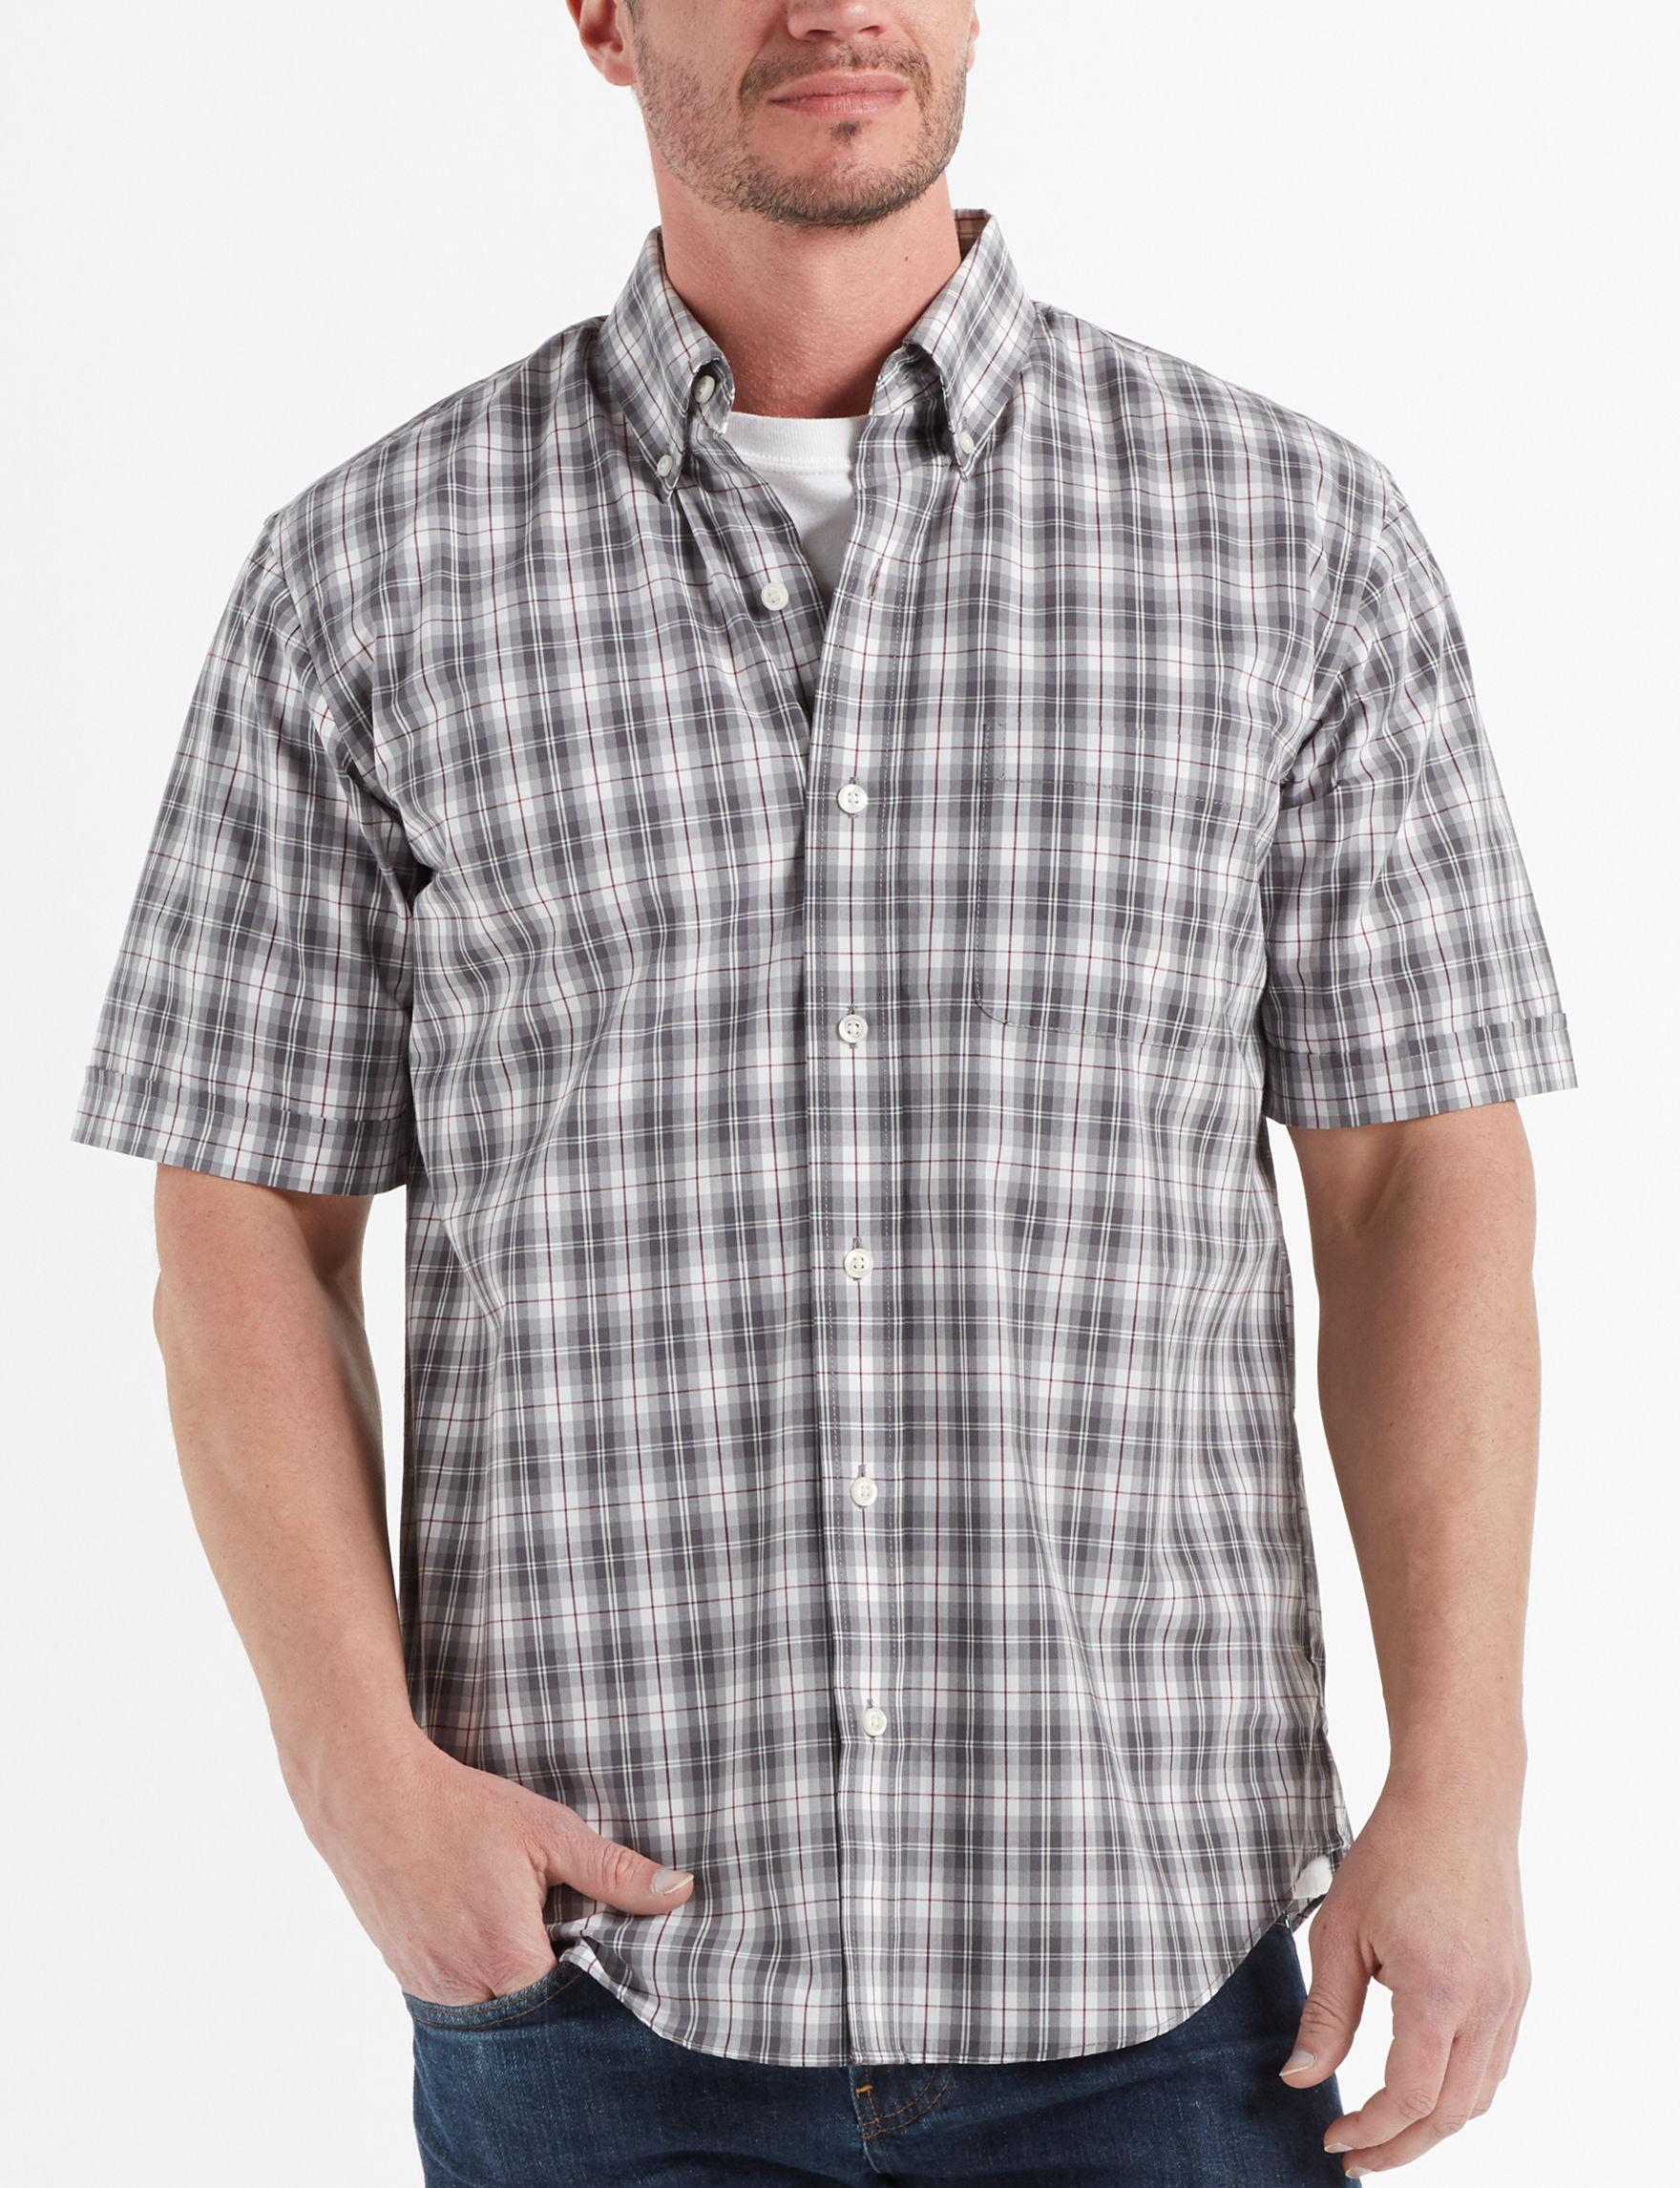 Arrow Dark Grey Plaid Casual Button Down Shirts